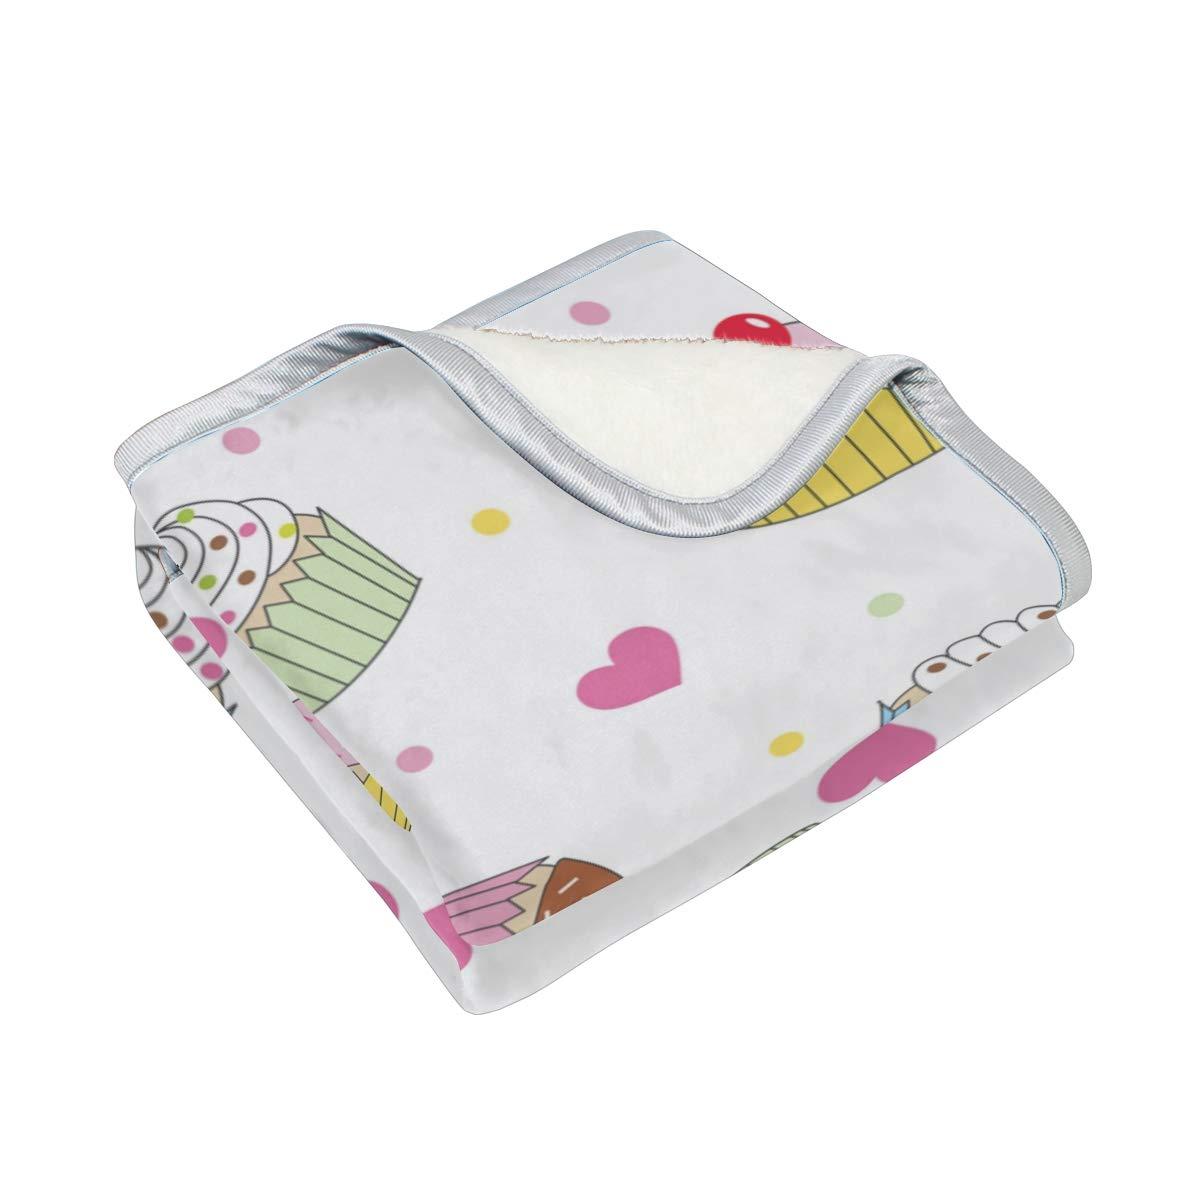 Amazon.com: Chen Miranda Cupcakes Blanket Super Soft ...